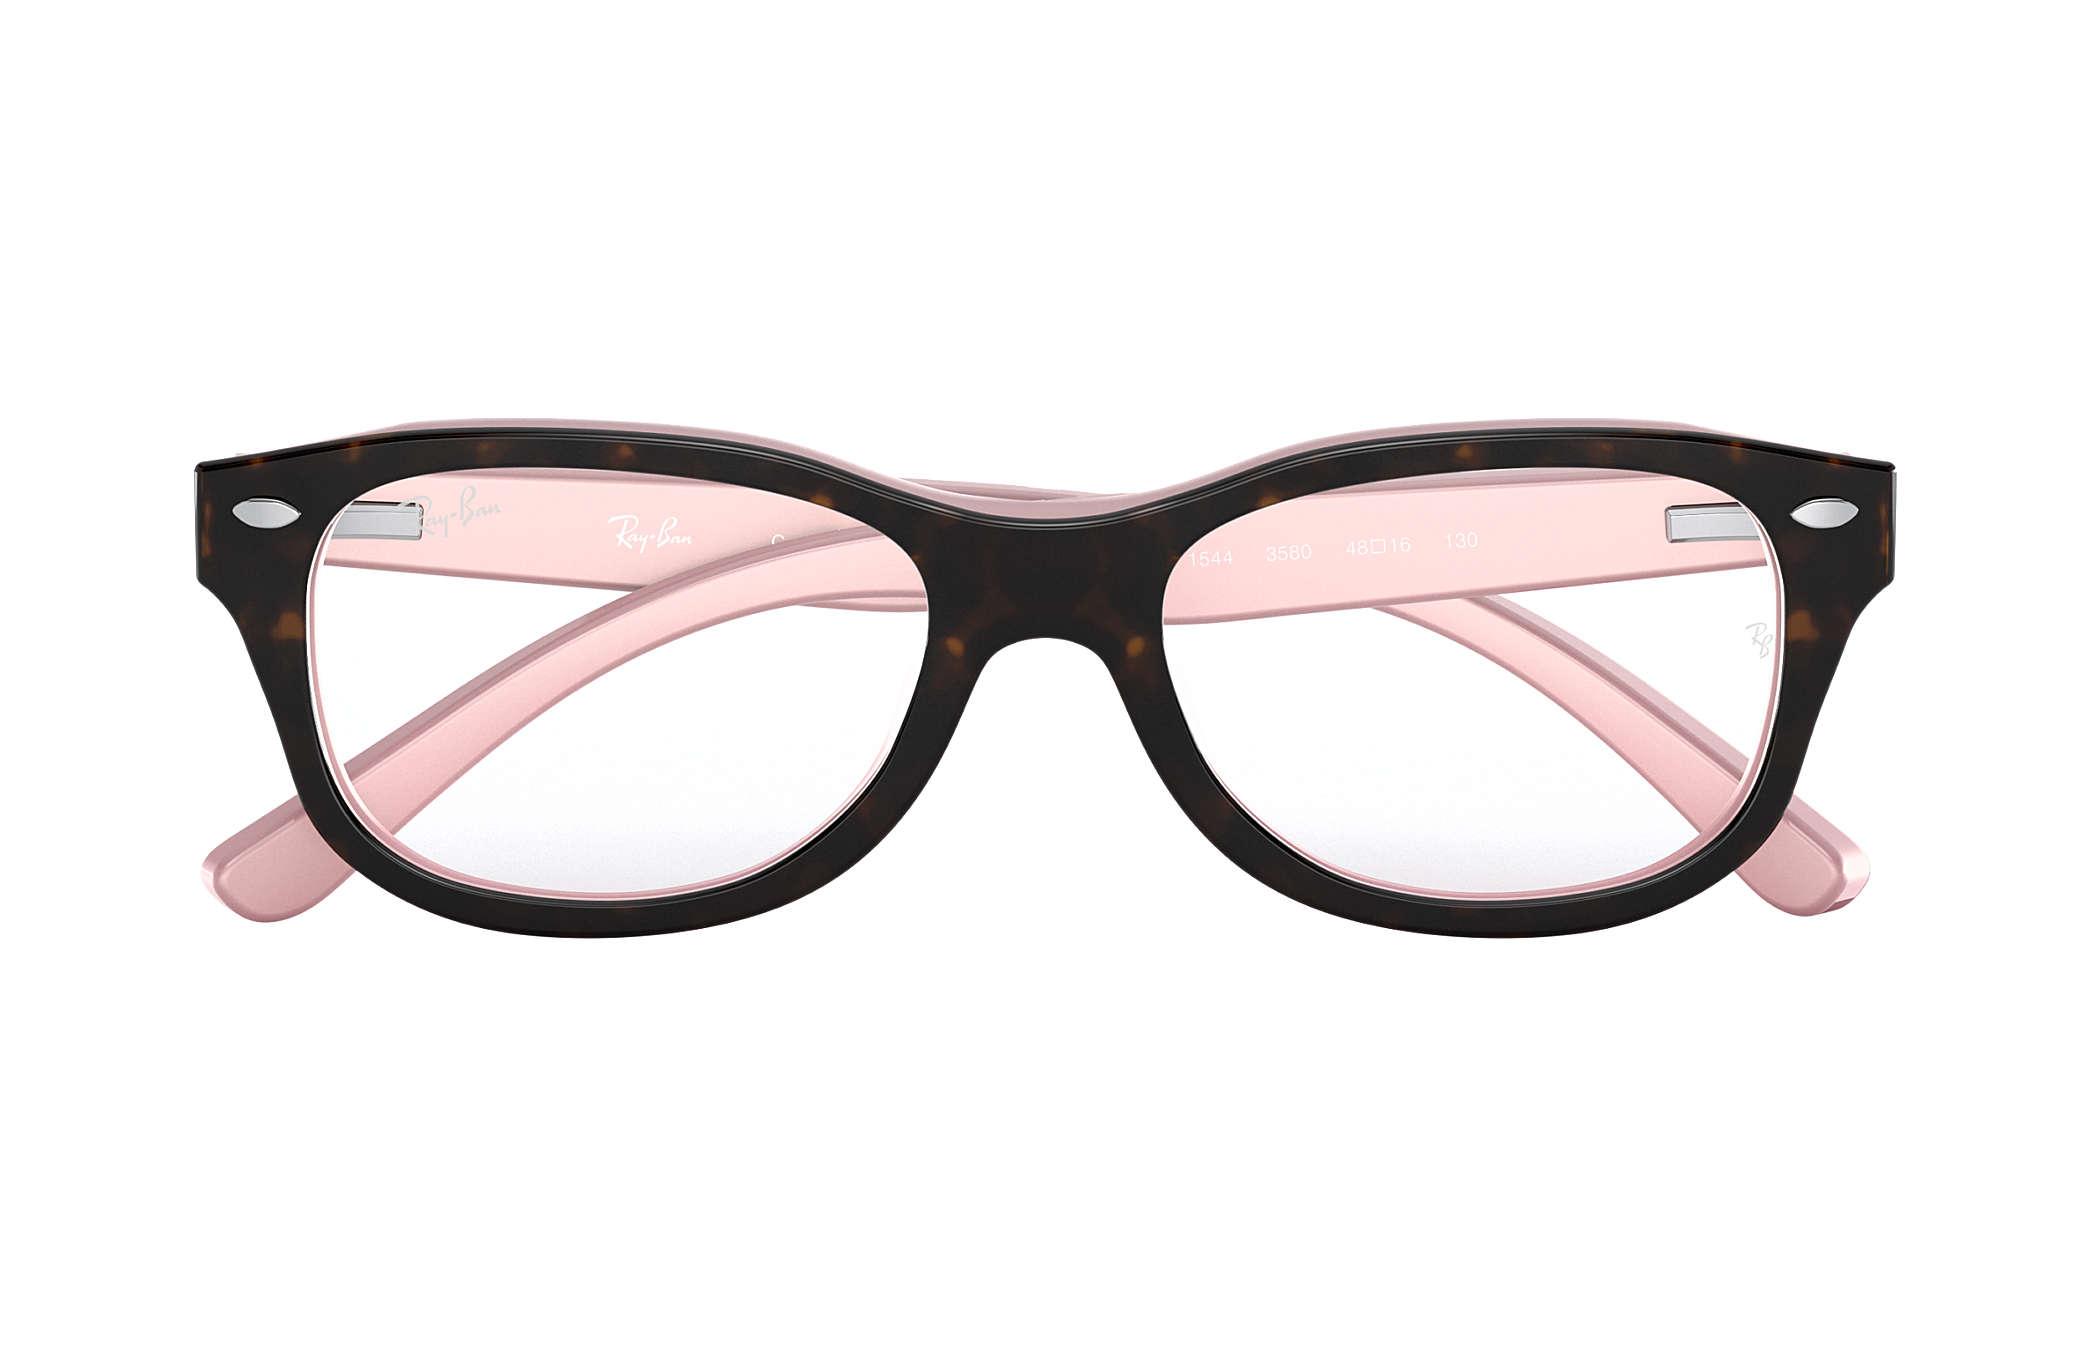 3584e2d596 Ray-Ban eyeglasses RY1544 Tortoise - Acetate - 0RY1544358046